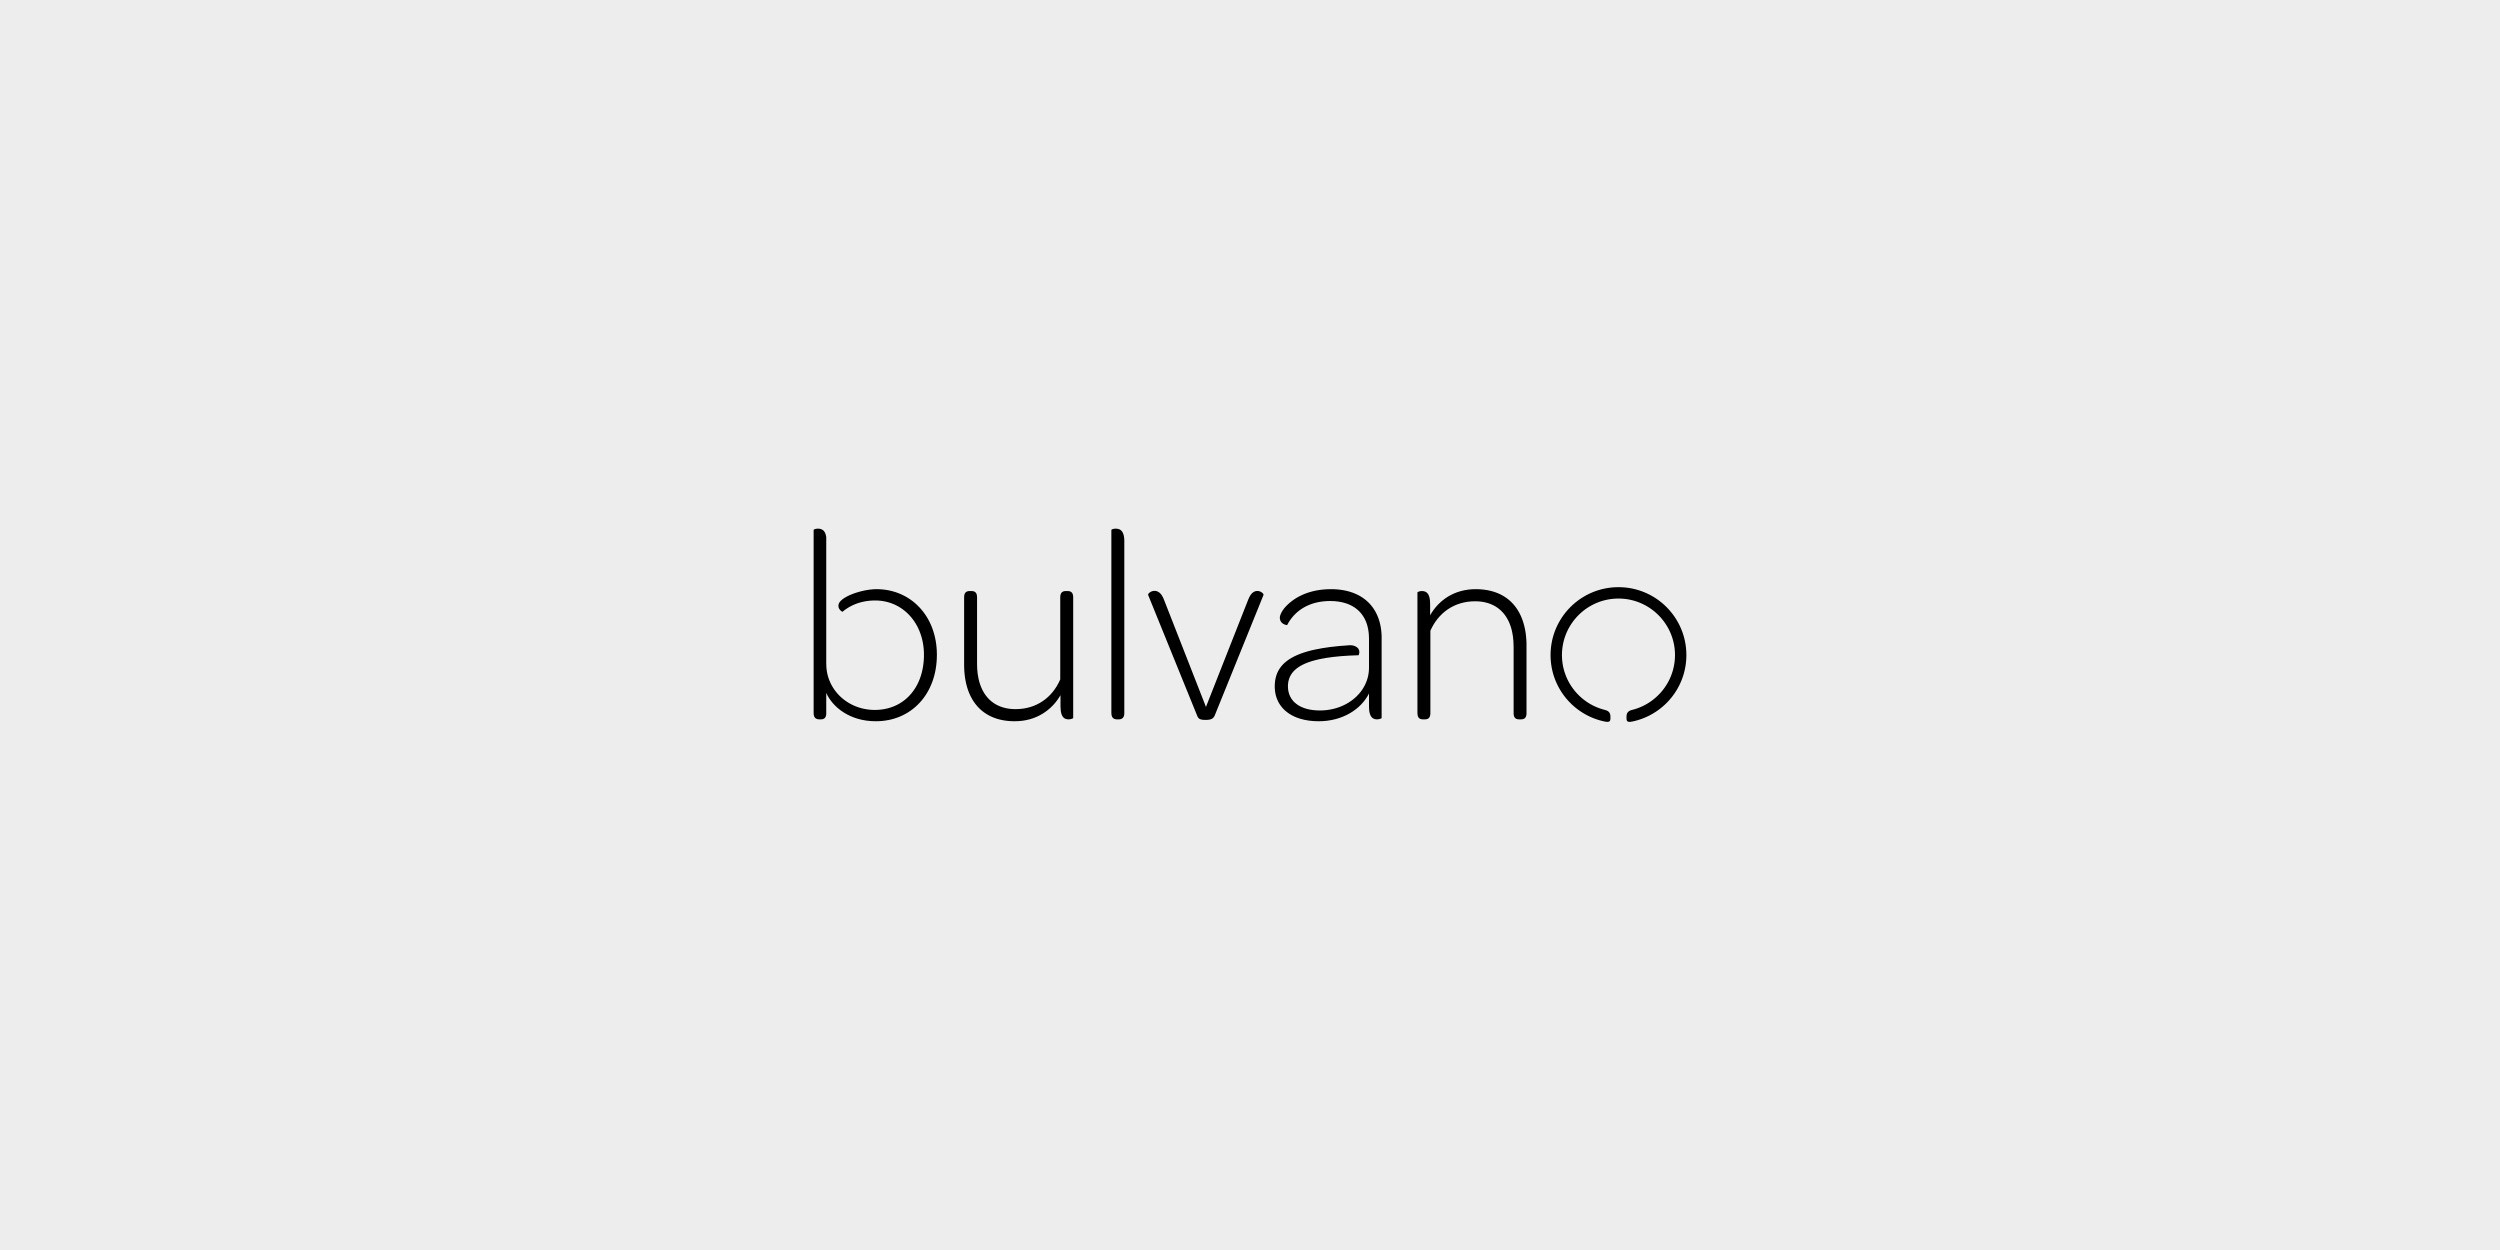 Bulvano